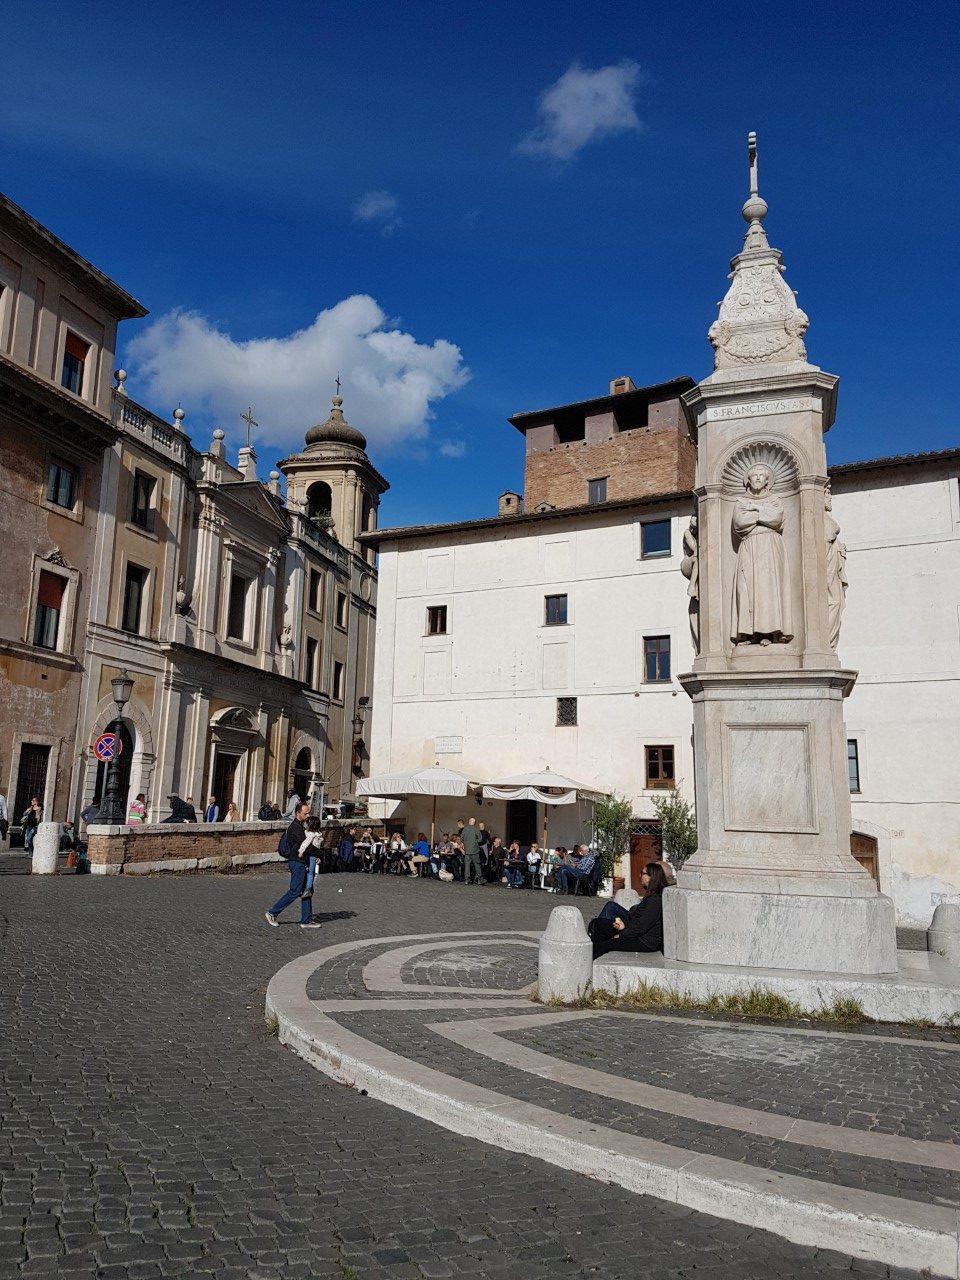 Tiberino Ristorante on Tiber island in Rome,offers breakfast, lunch, aperitivo or dinner with river views.